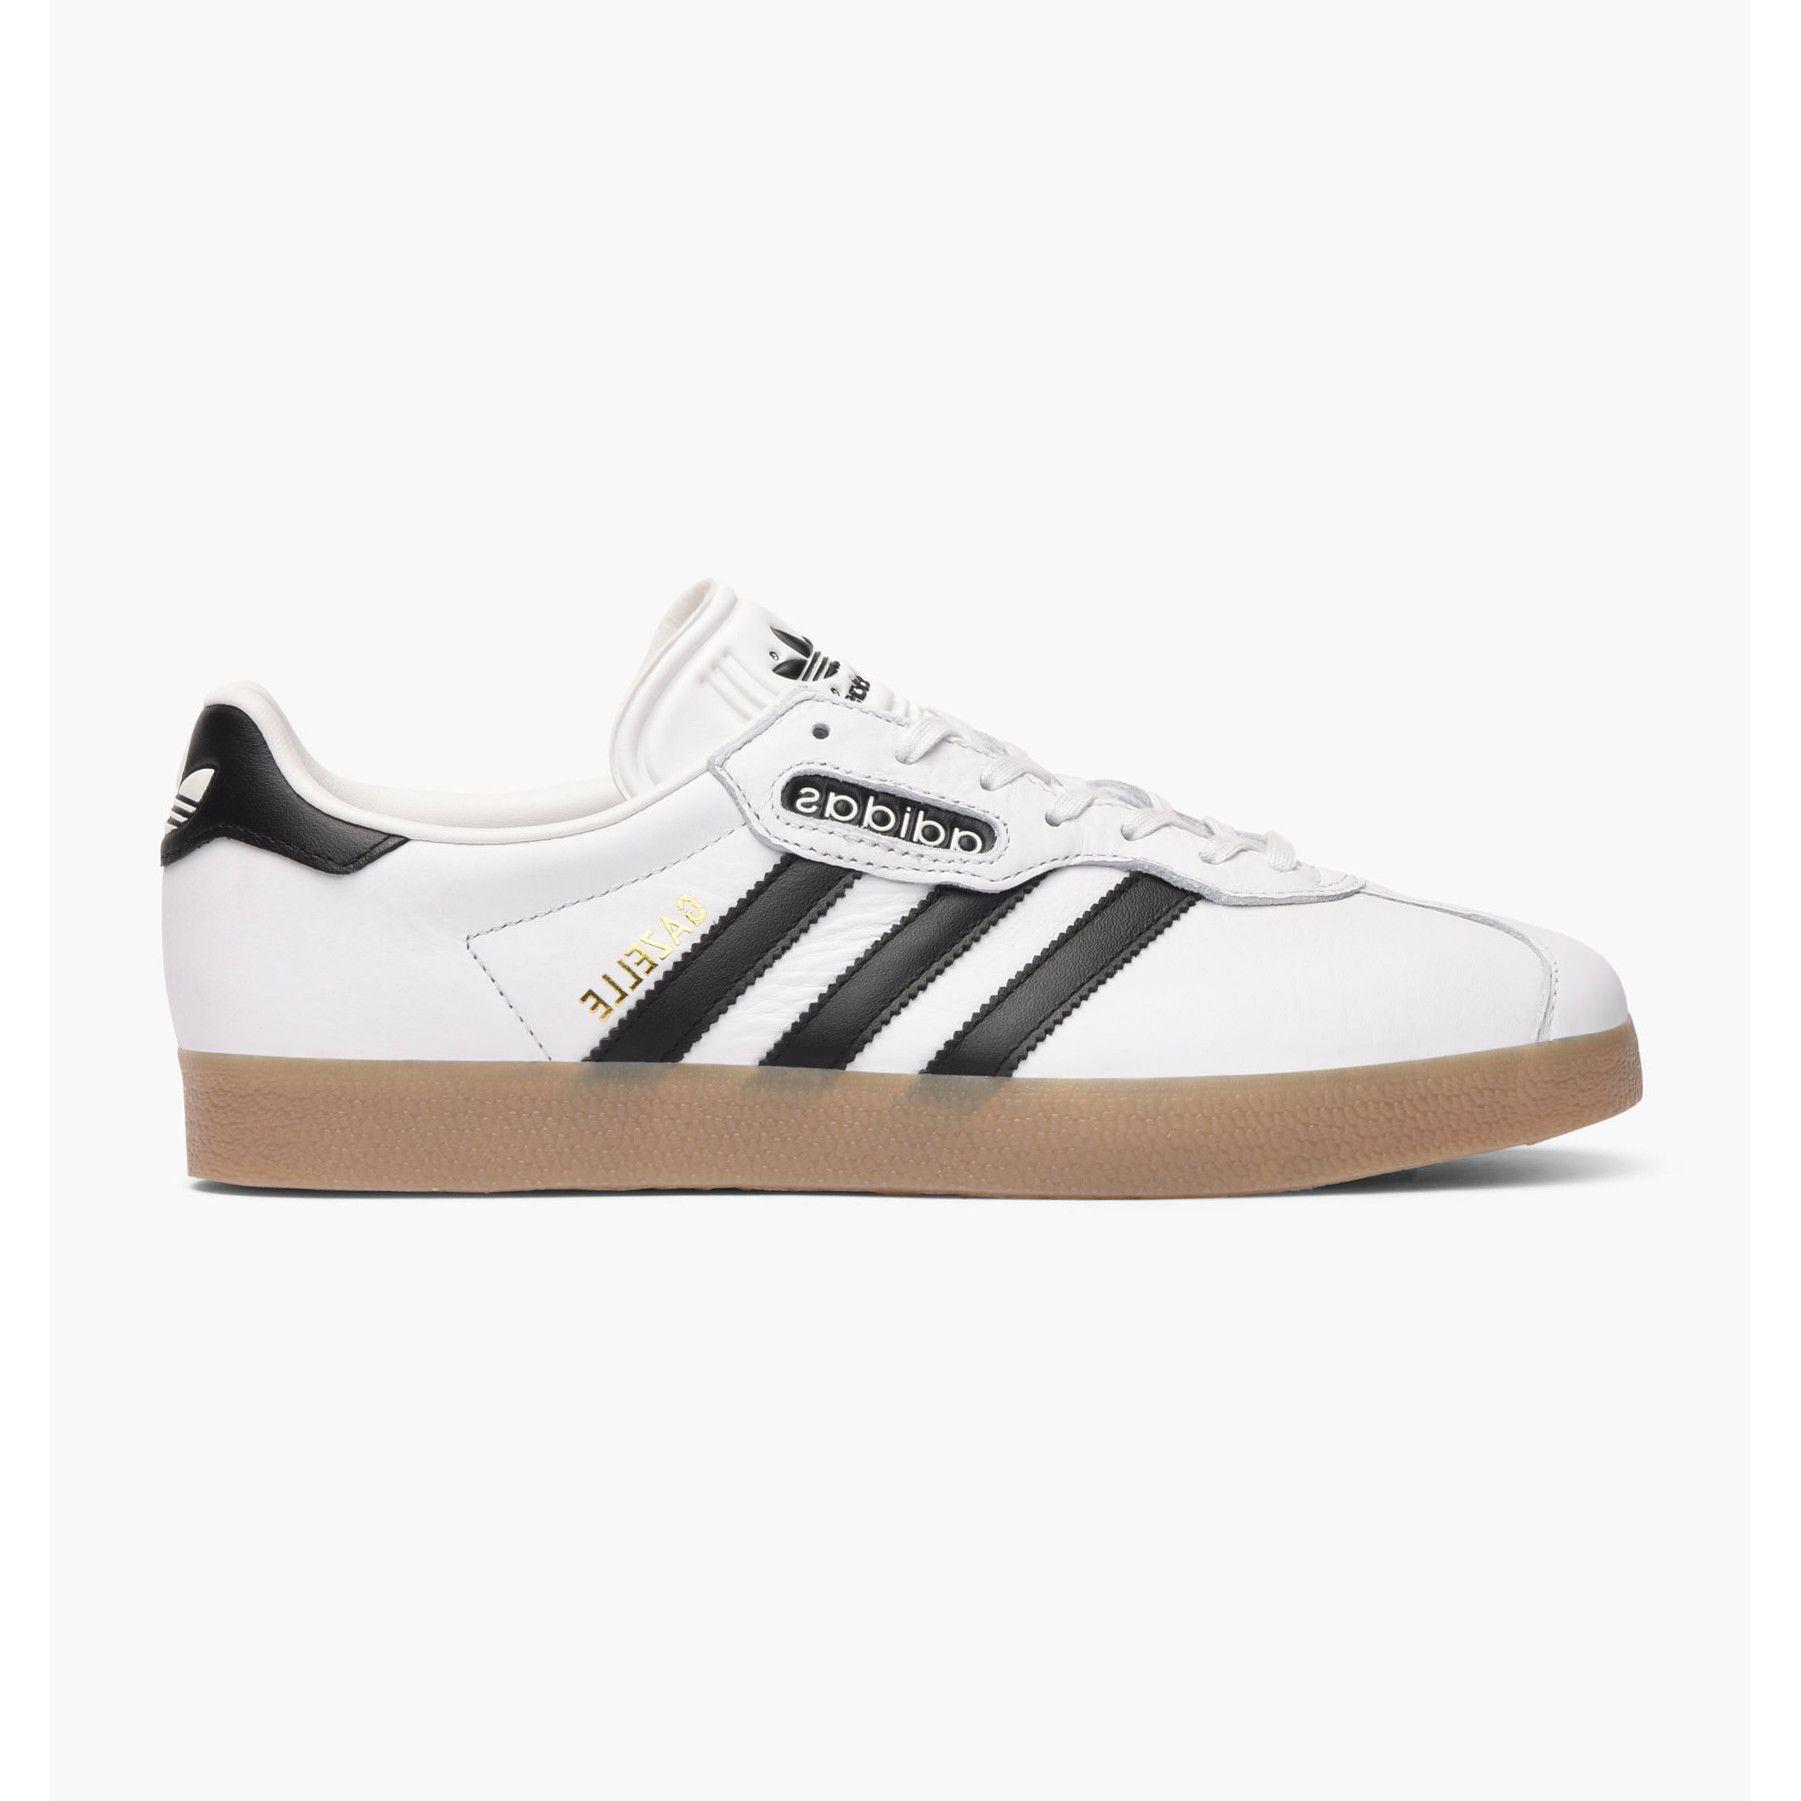 Pantofi Sport Adidas Gazelle Super, Barbati, Alb BB5243 43.5 EU